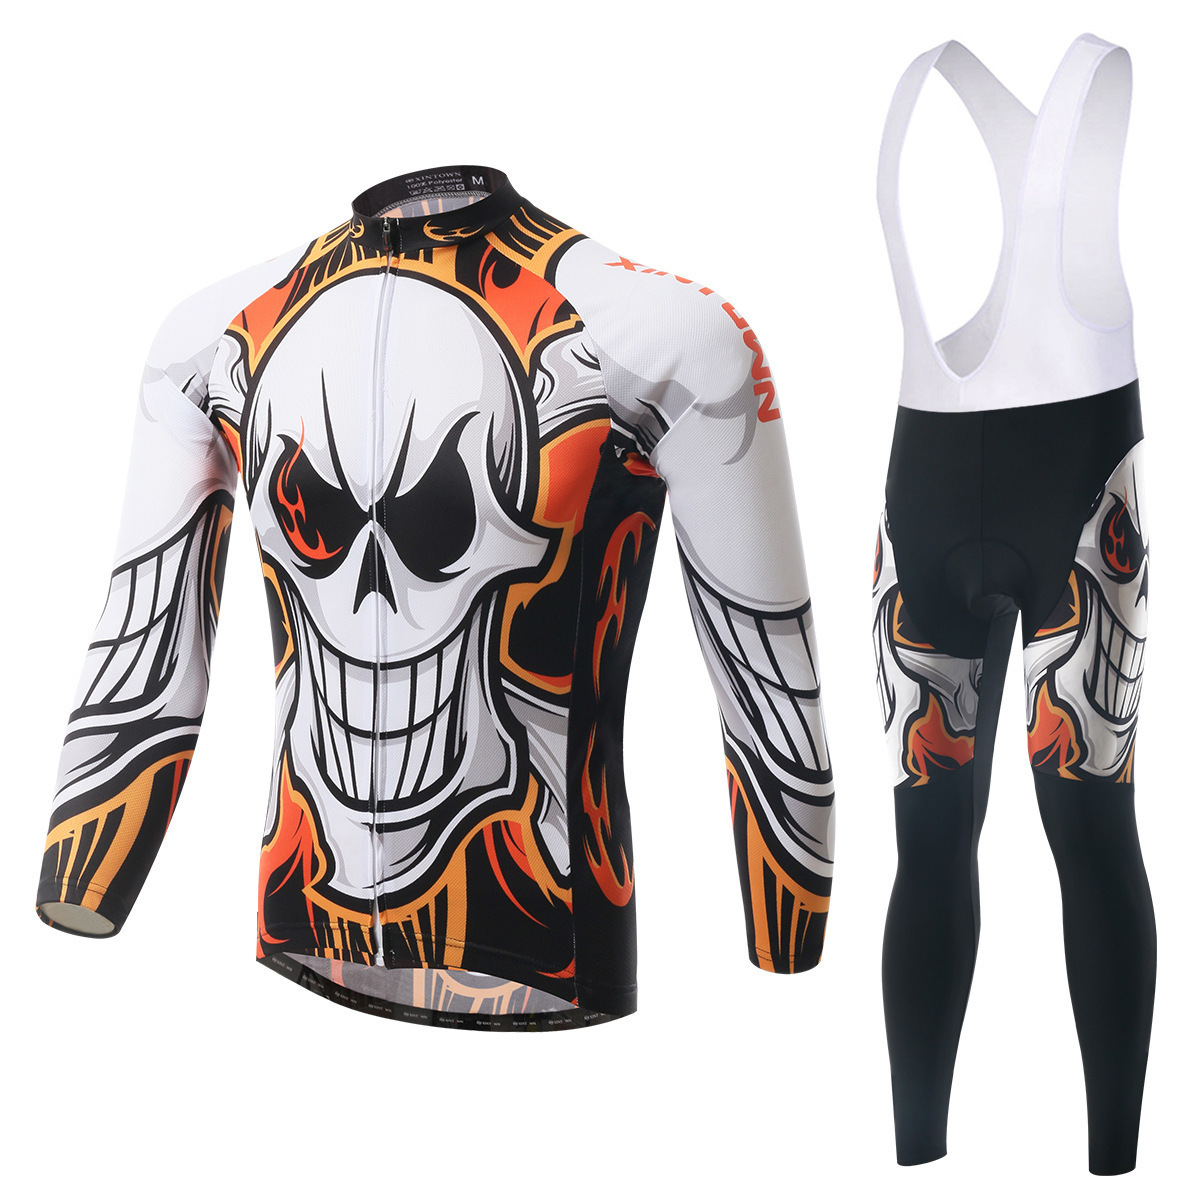 BOODUN Riding Suit Straps Long Sleeve Suit Bicycle Serve Catch Down Windbreak Keep Warm Function Underwear